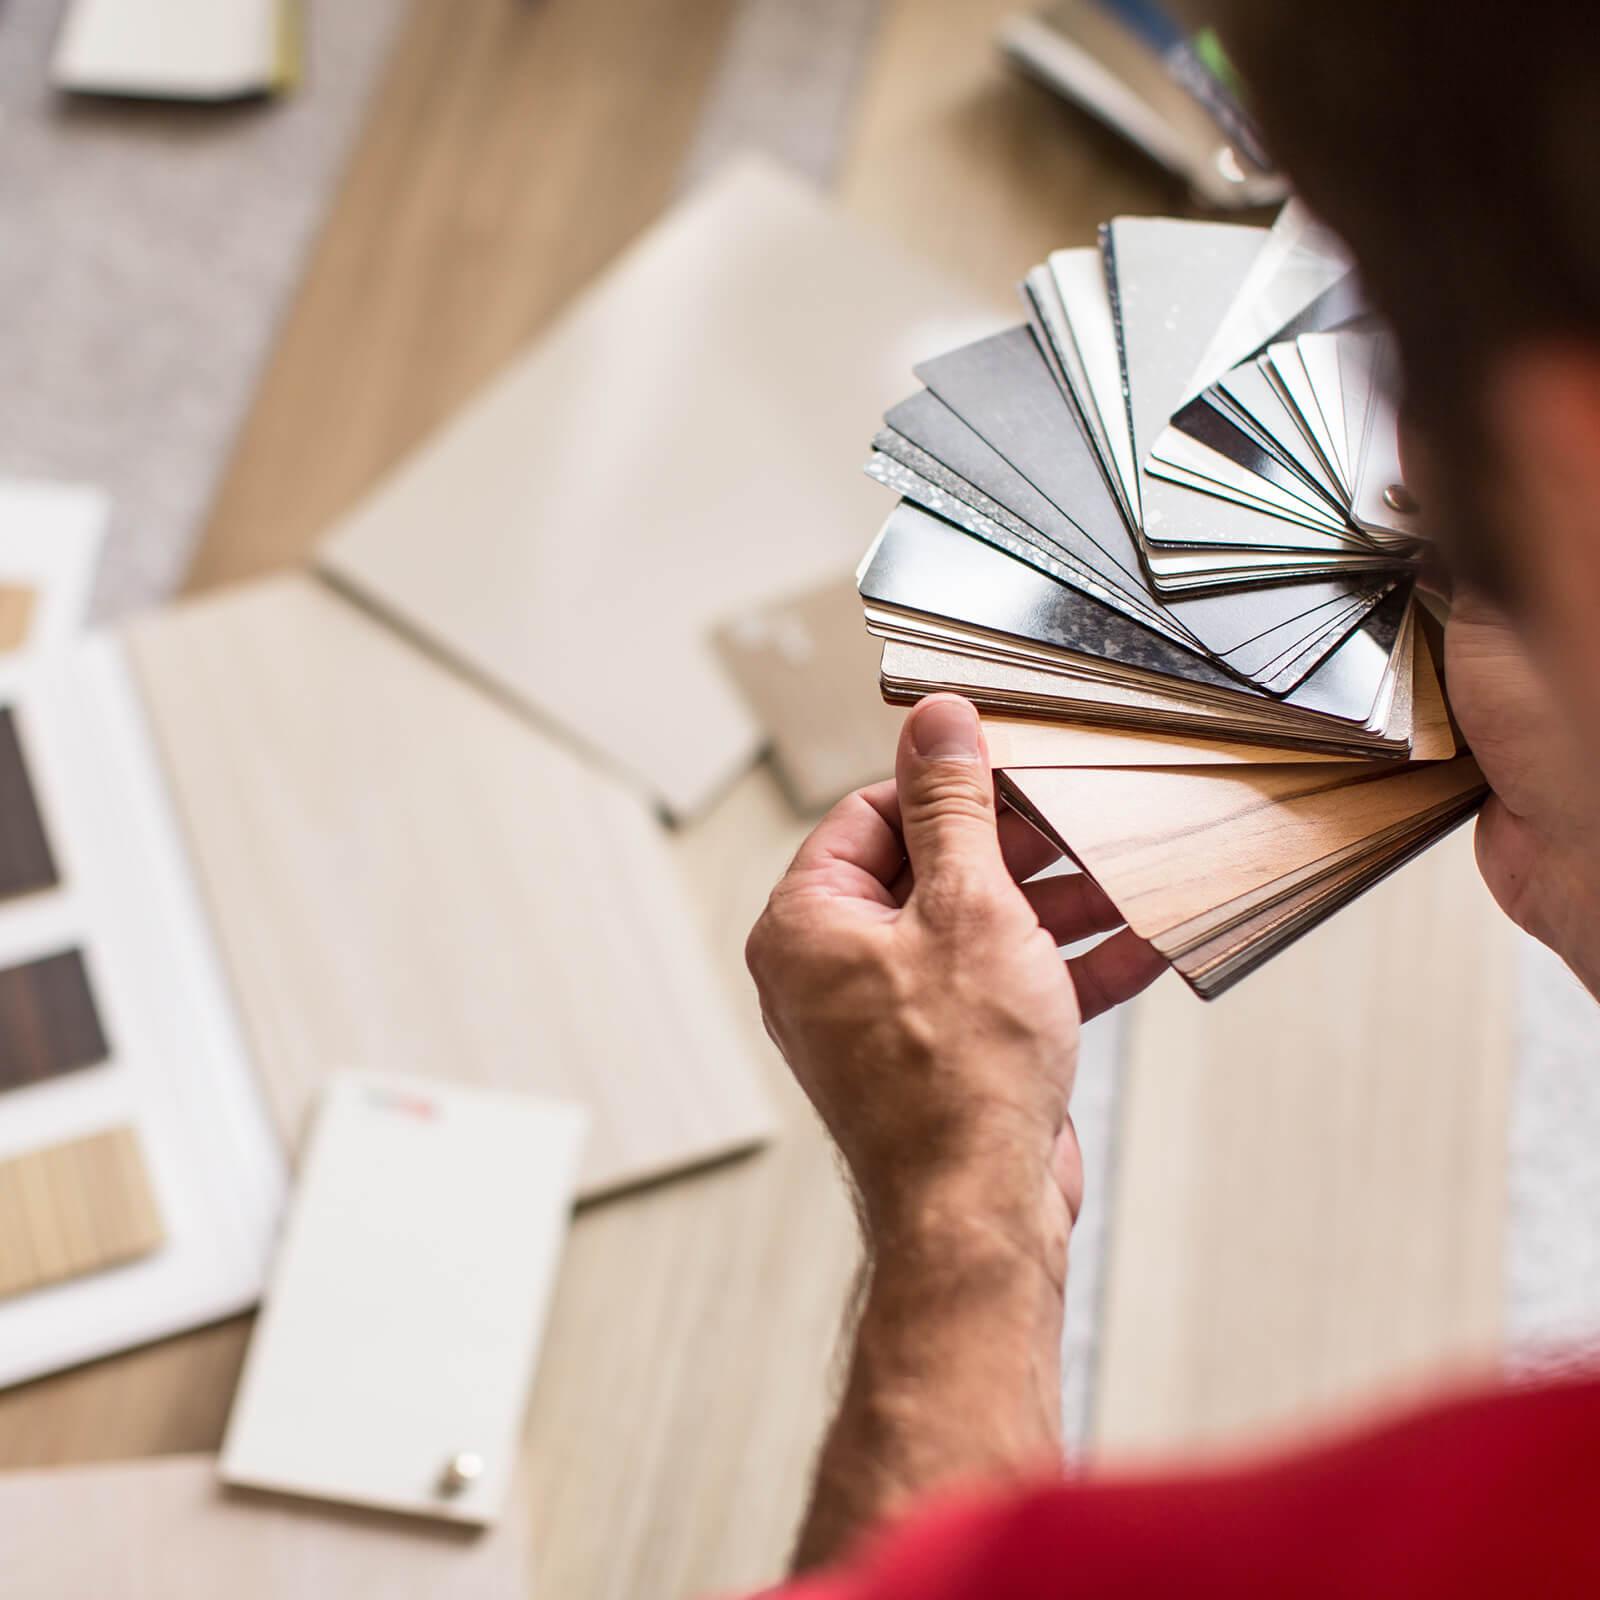 Shop at home | Warnike Carpet & Tile